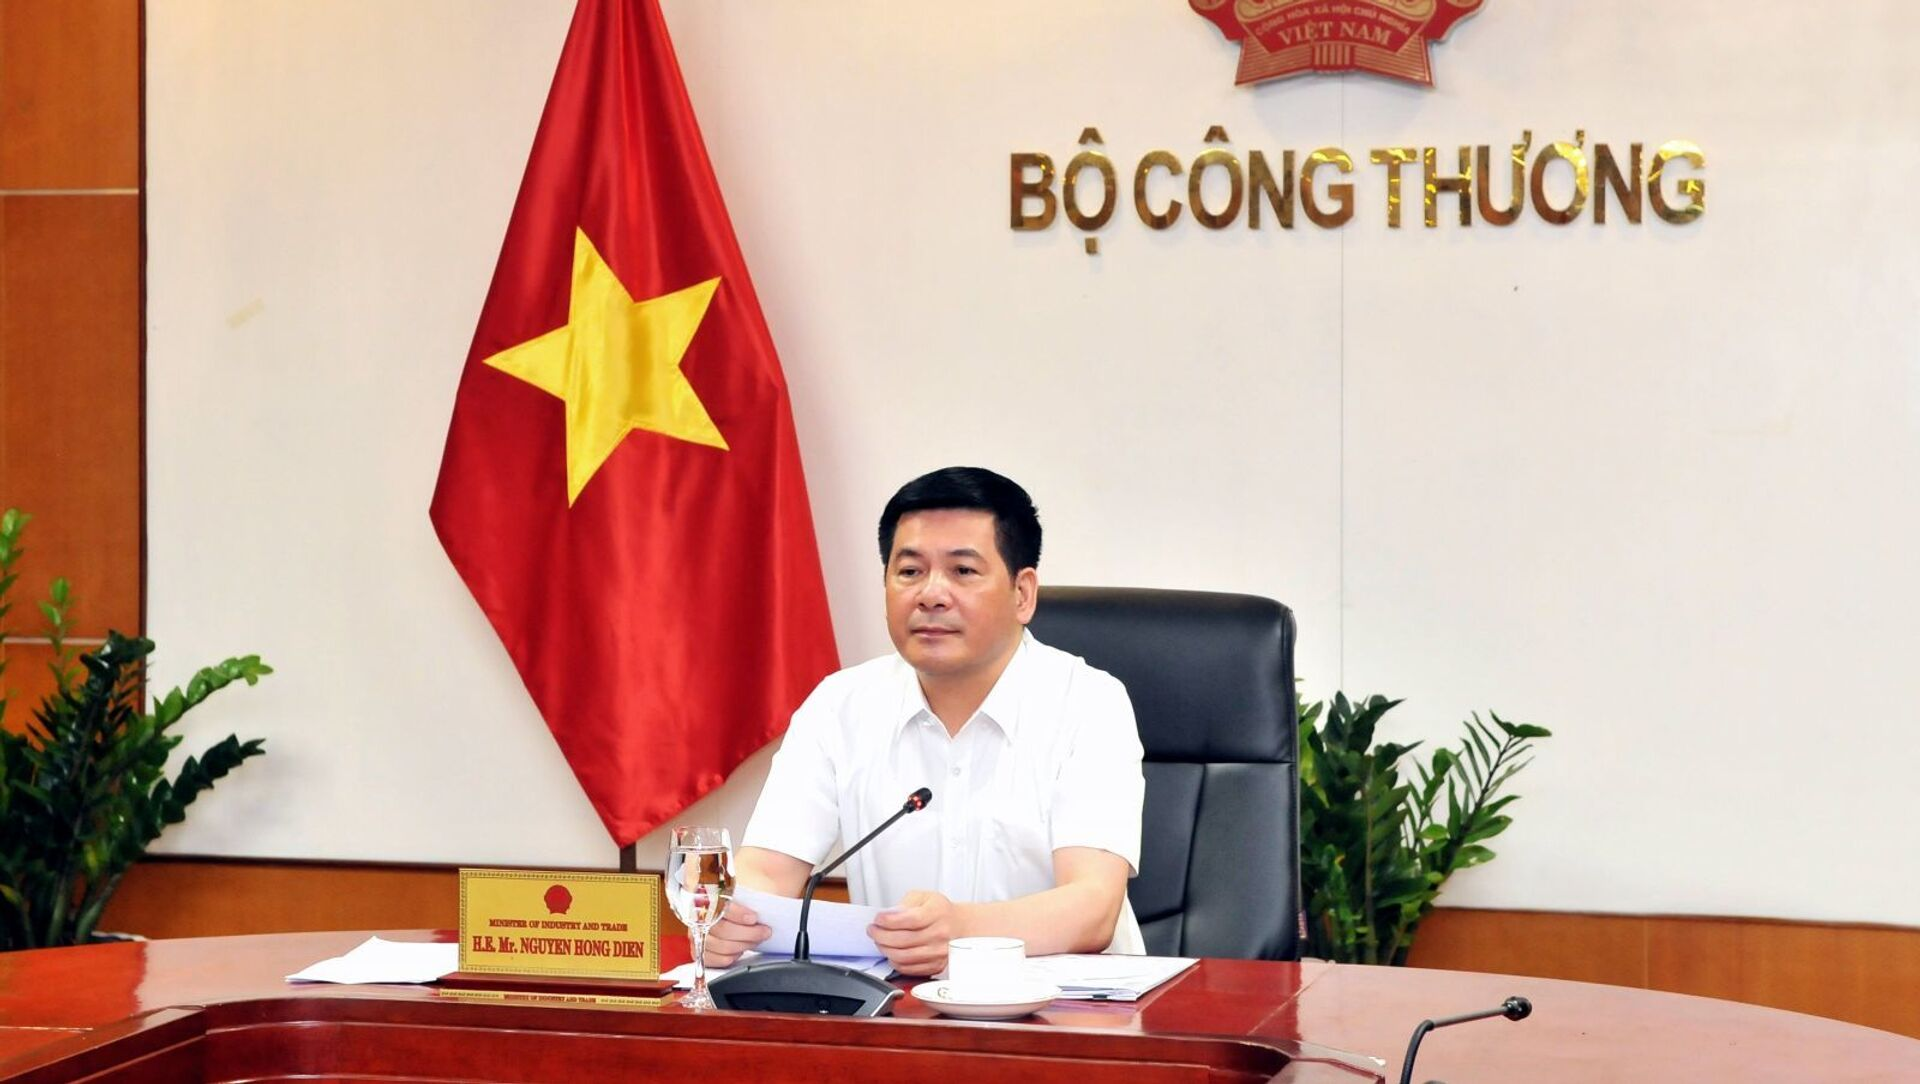 Ông Nguyễn Hồng Diên. - Sputnik Việt Nam, 1920, 10.09.2021